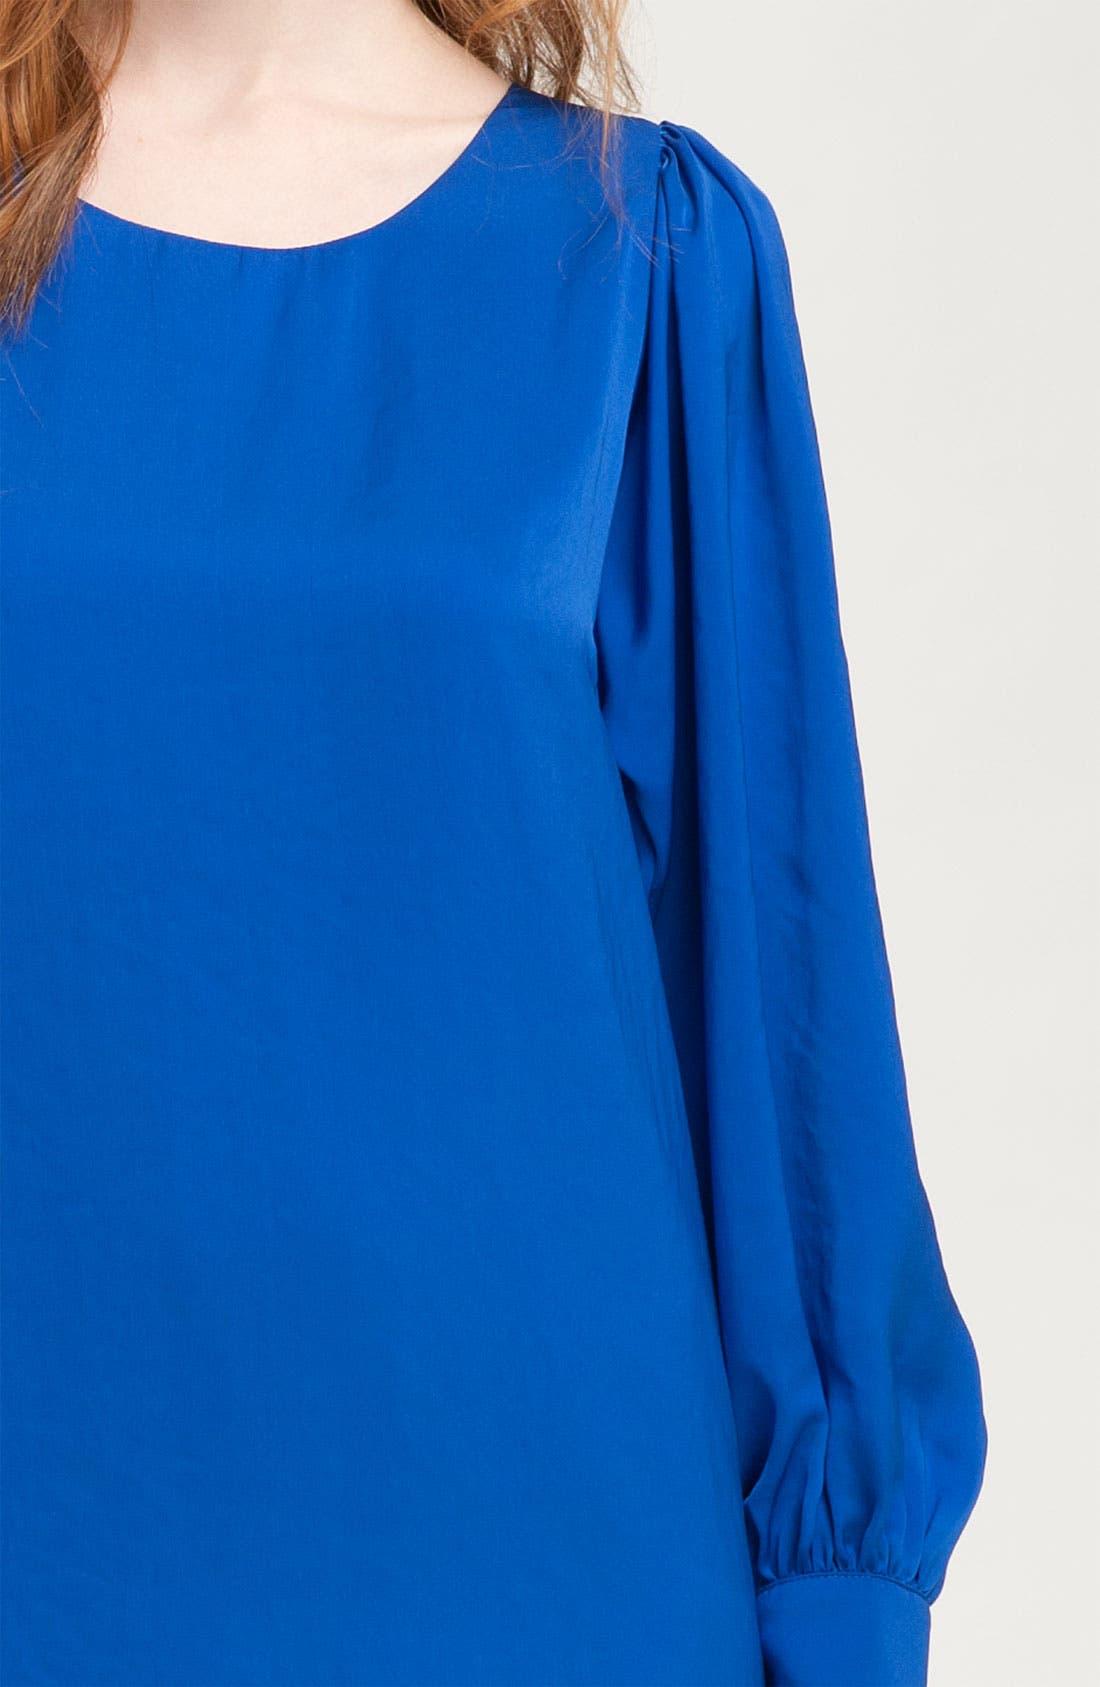 Alternate Image 3  - Rory Beca 'Juliette' Gathered Sleeve Shift Dress